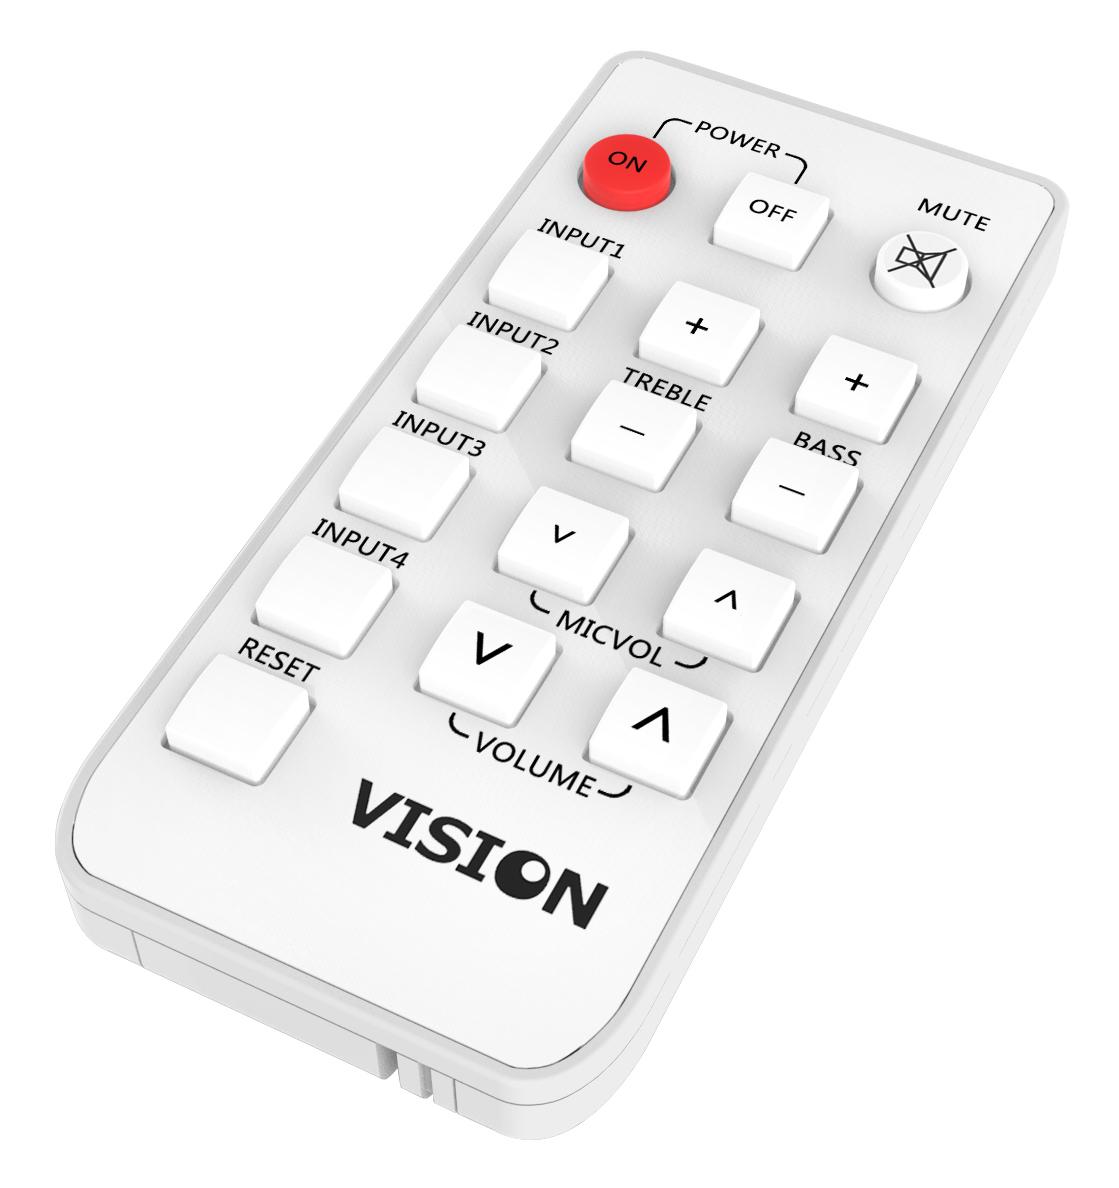 Vision TC2 RC remote control